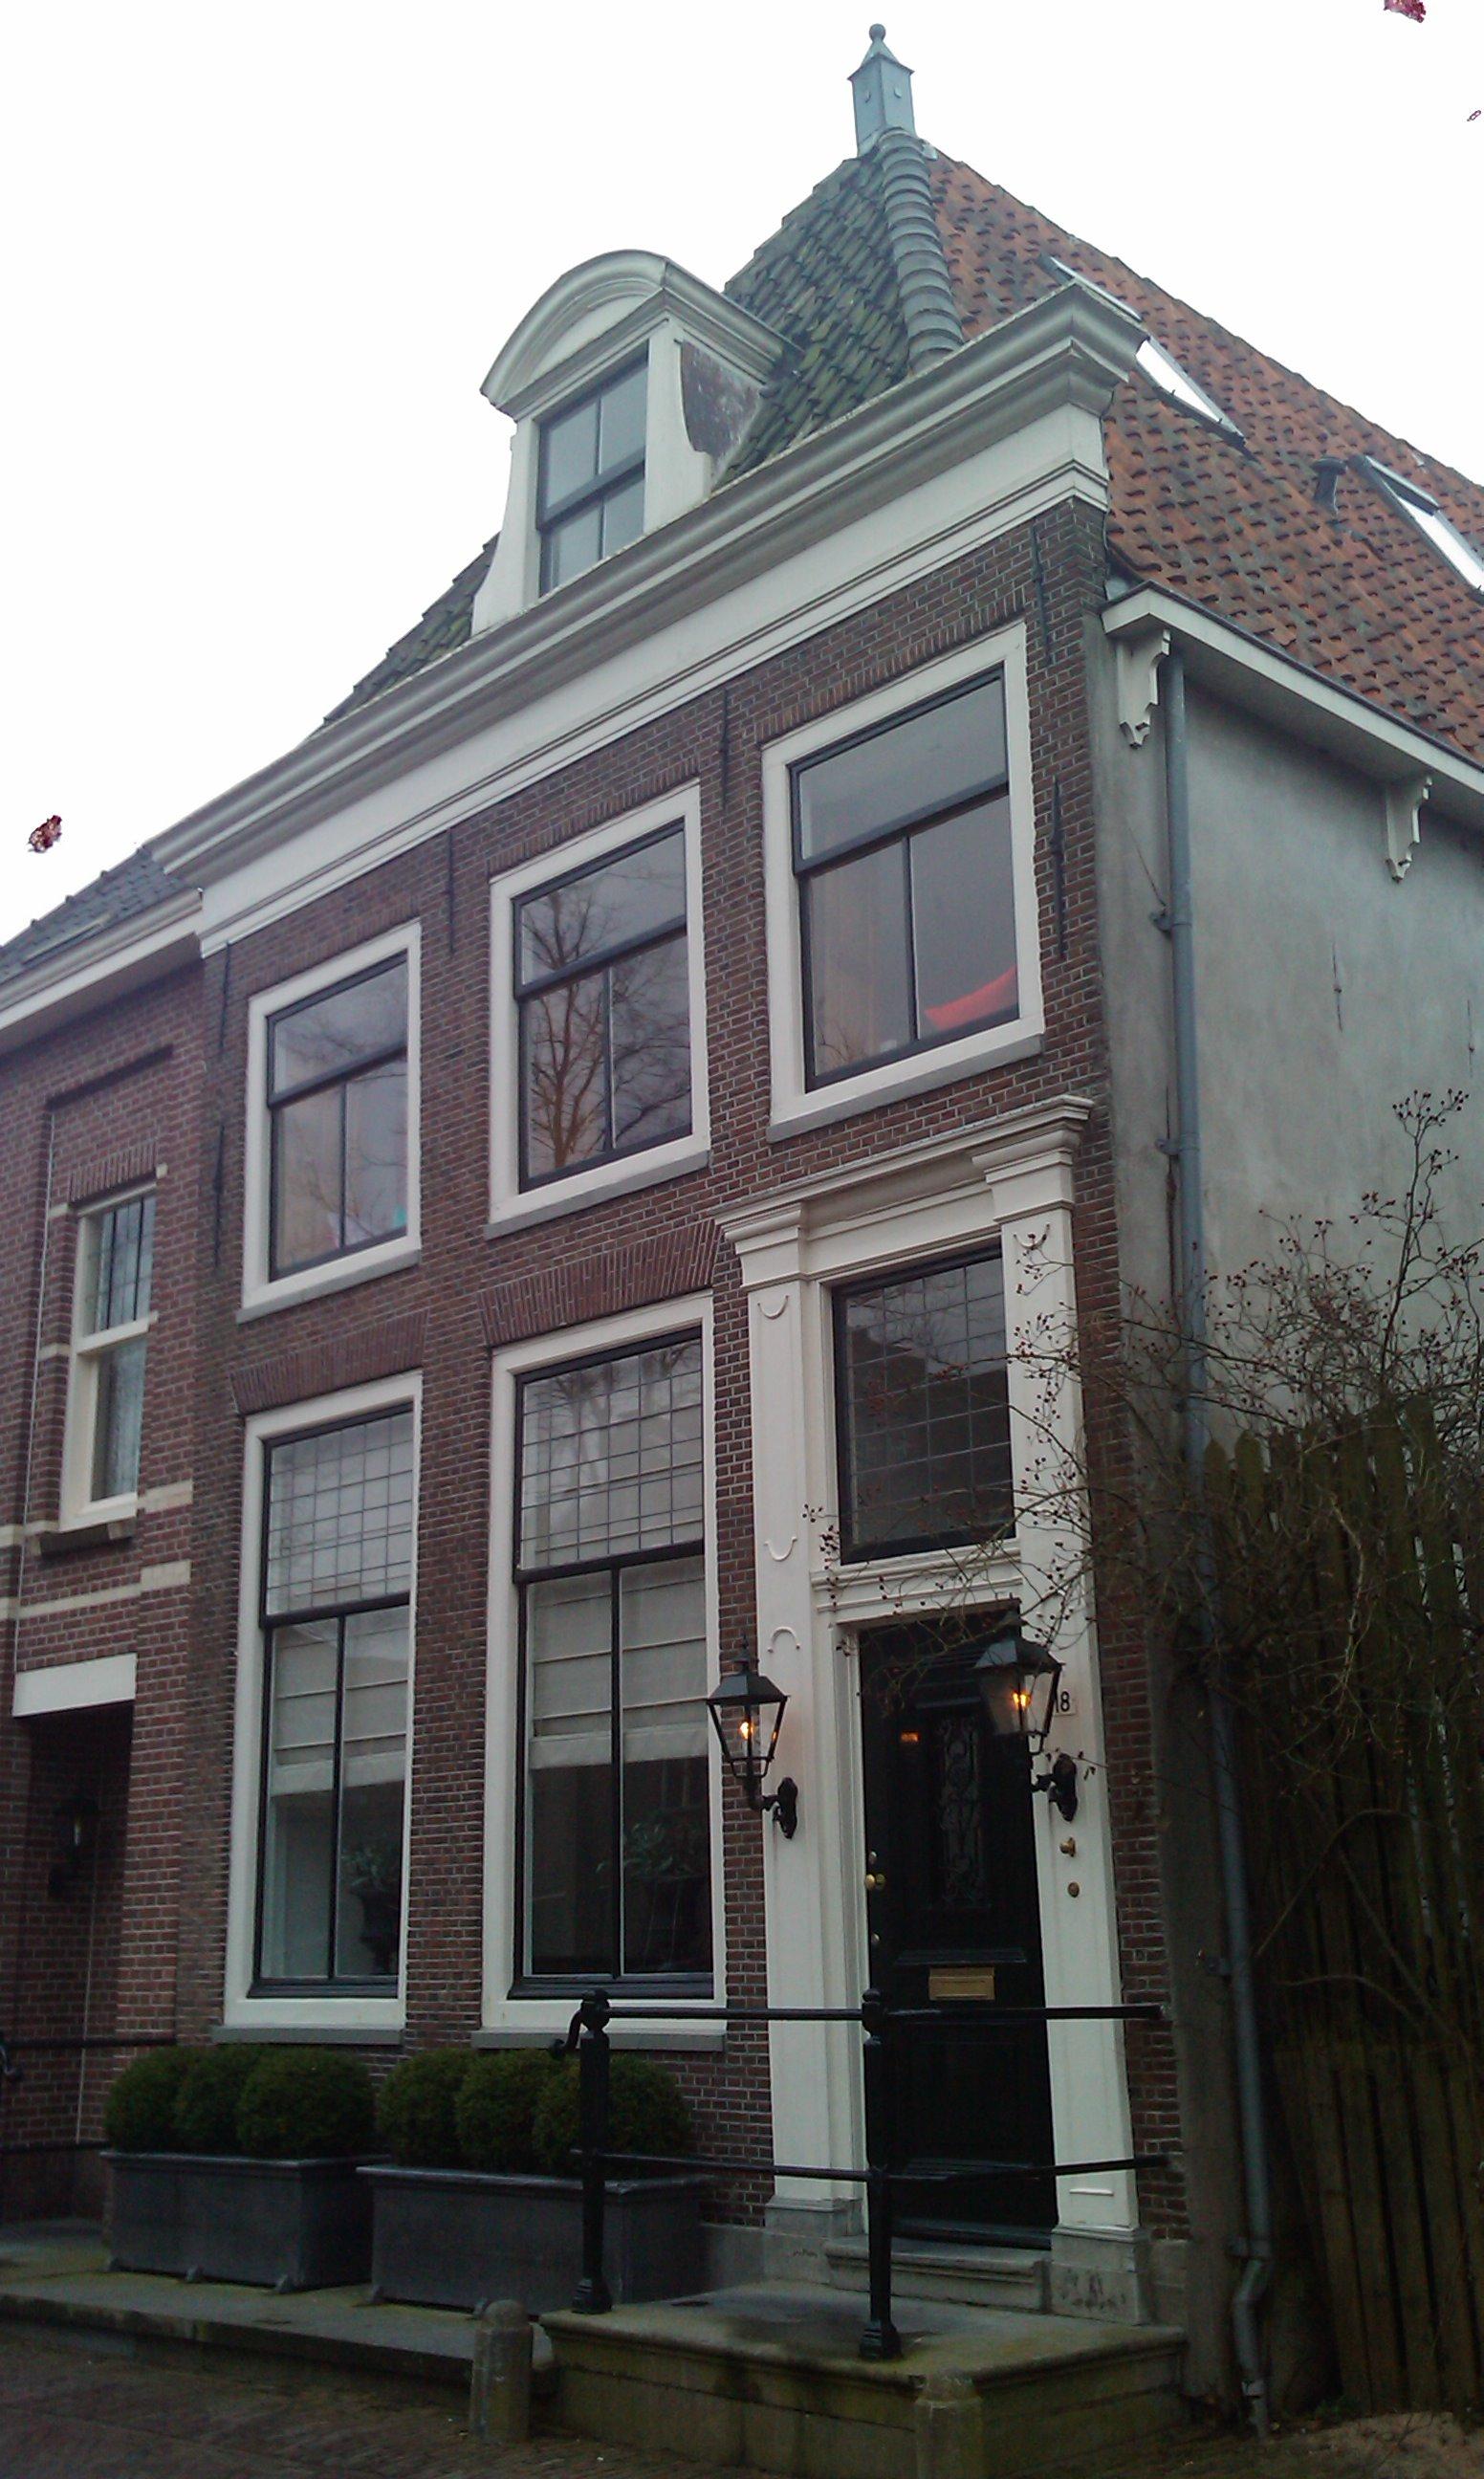 Eenvoudig laat 18e vroeg 19e eeuws huis met omlijste ingang in hoorn monument - Huis ingang ...